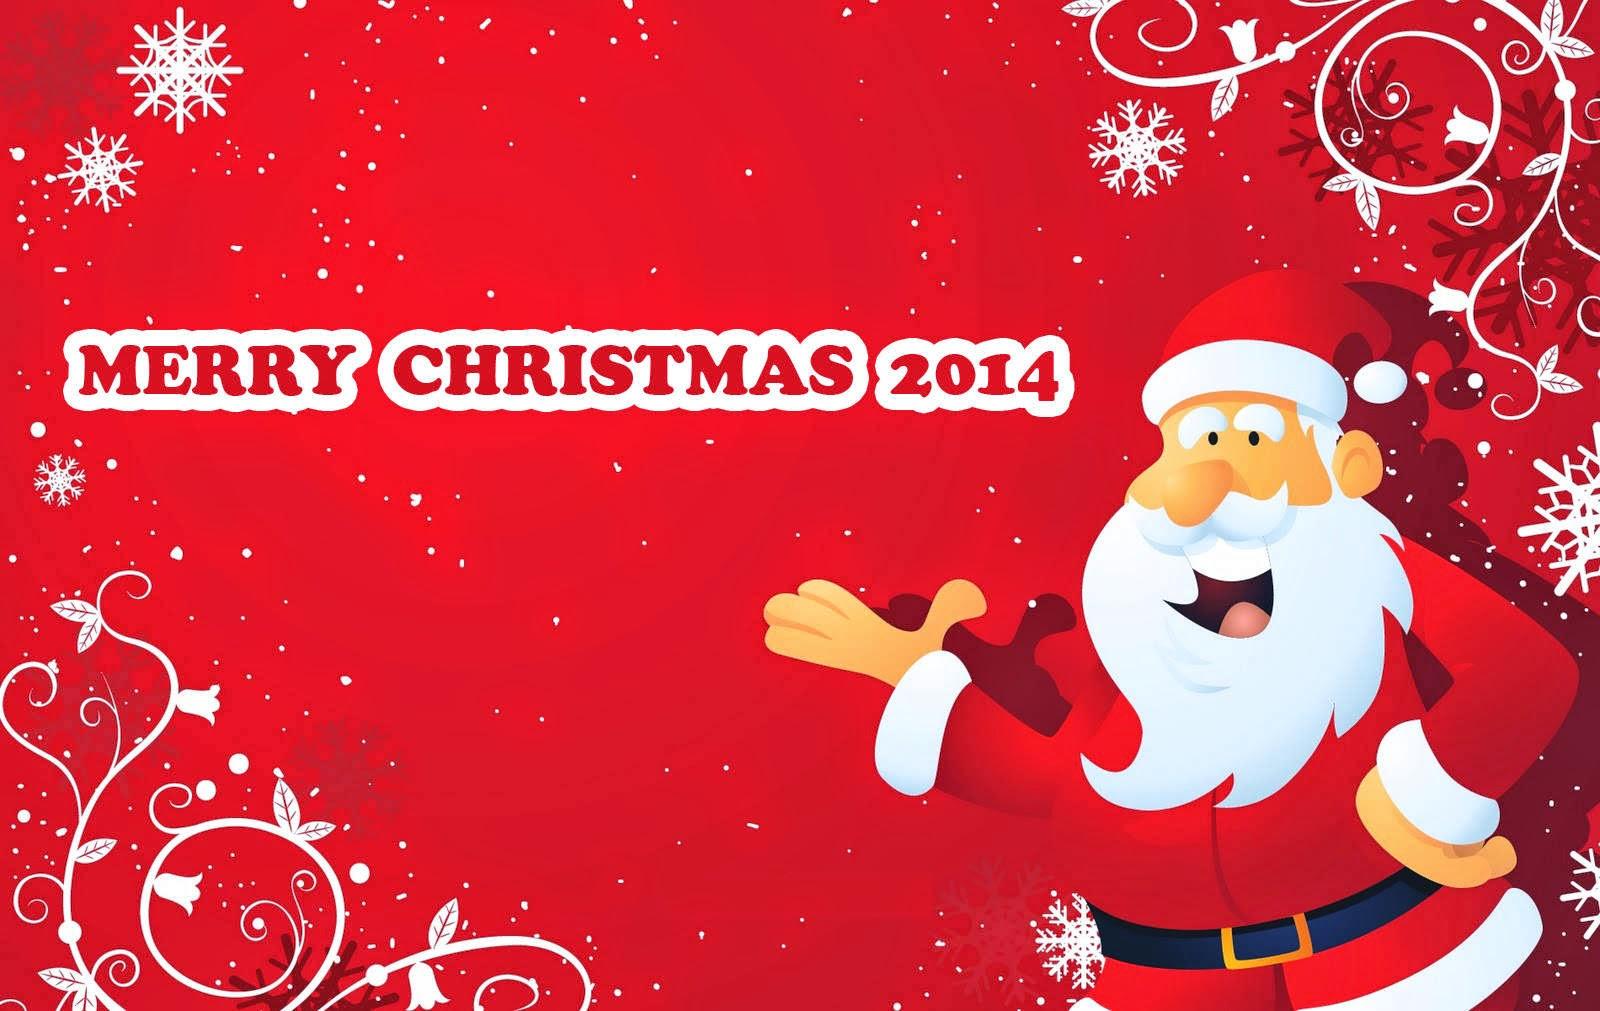 merry christmas 2014 greetings wallpaper [brand new] | happy new